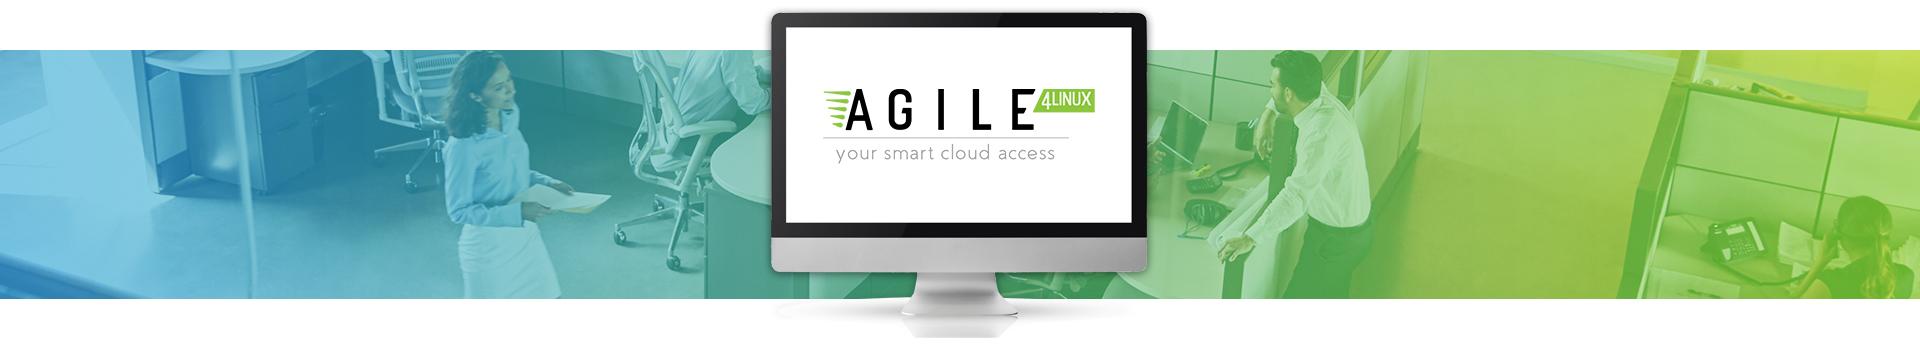 Agile4Linux banner